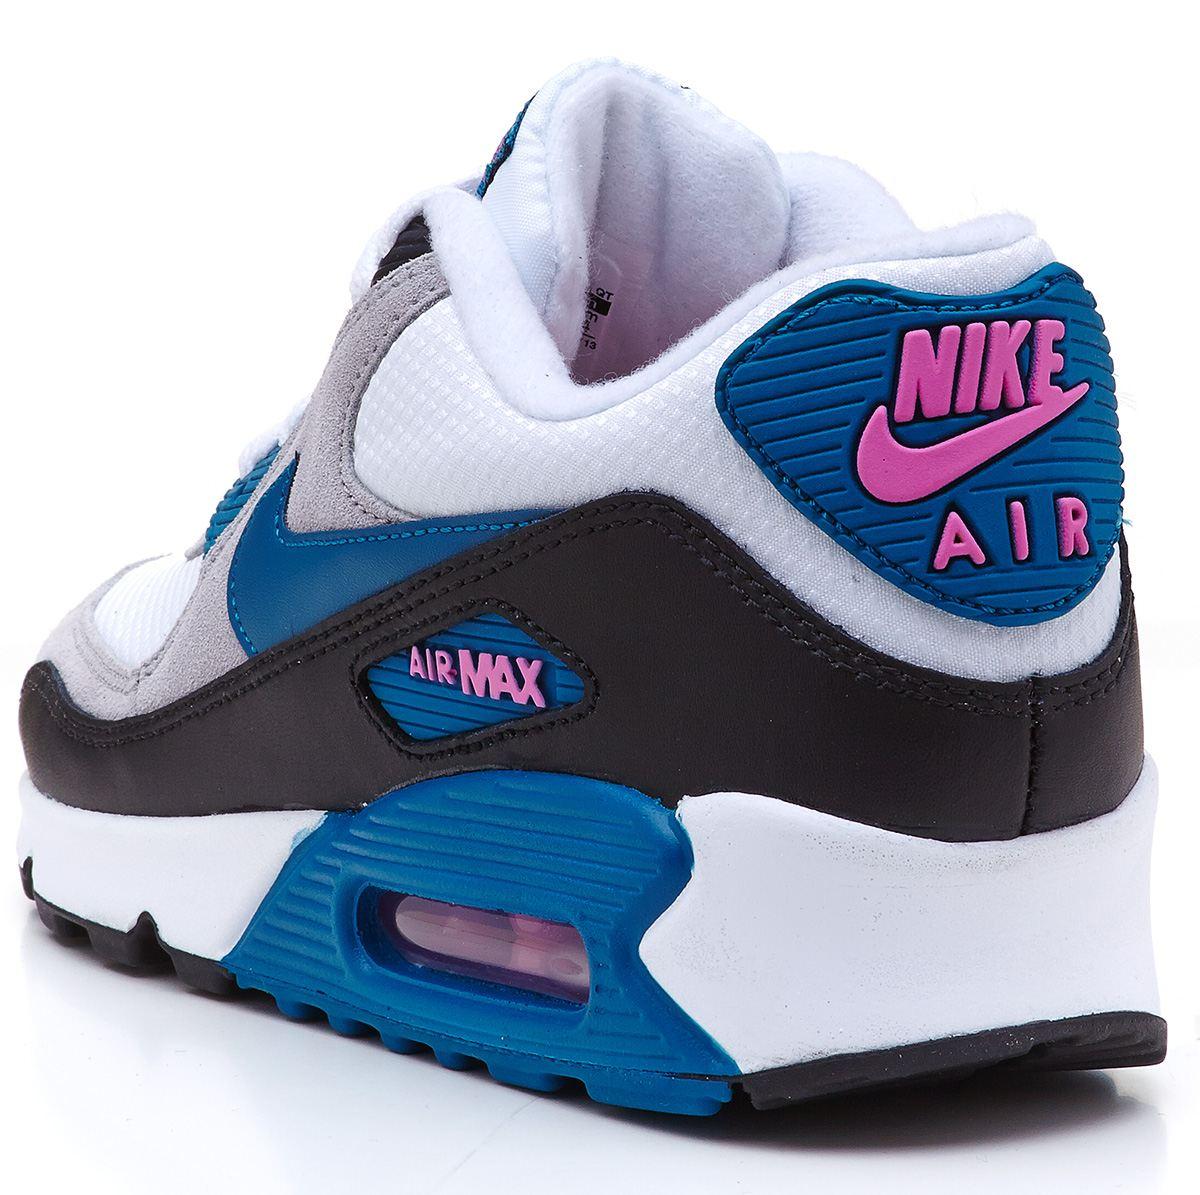 Nike Air Max 90 Essential white \u0026amp; blue \u0026amp; pink trainers 616730 103